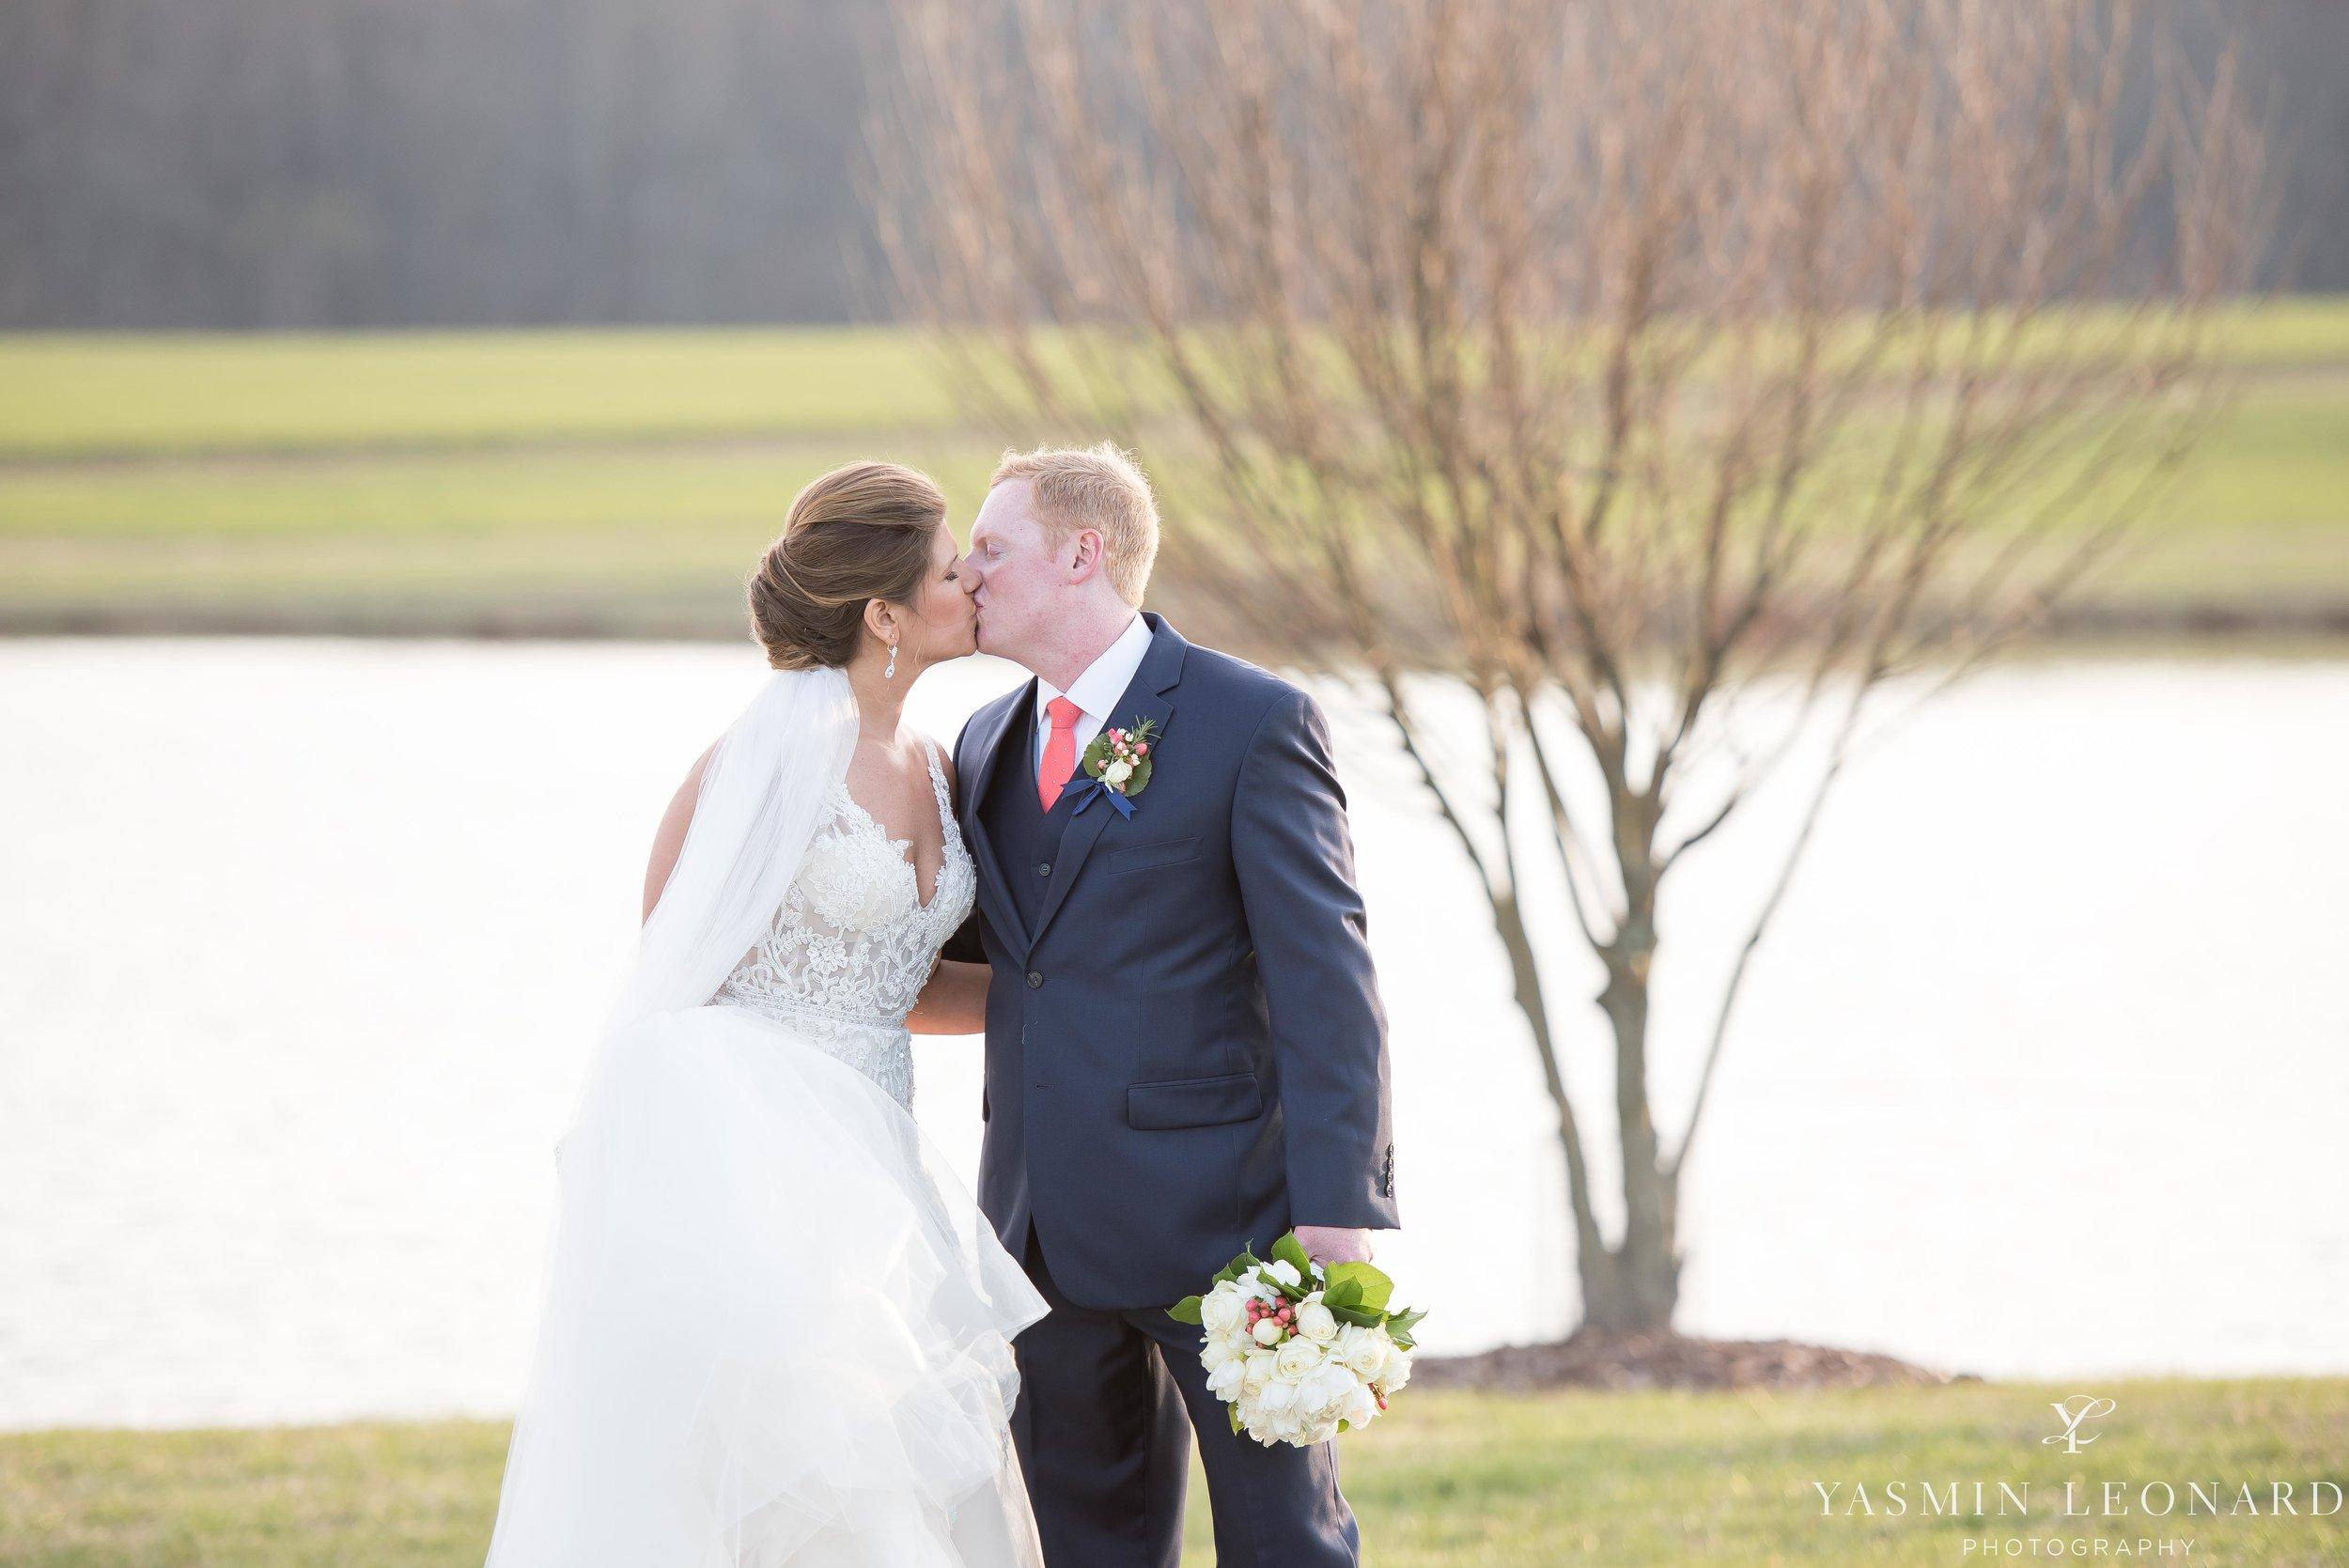 Adaumont Farm - Adaumont Farm Weddings - Trinity Weddings - NC Weddings - Yasmin Leonard Photography-50.jpg